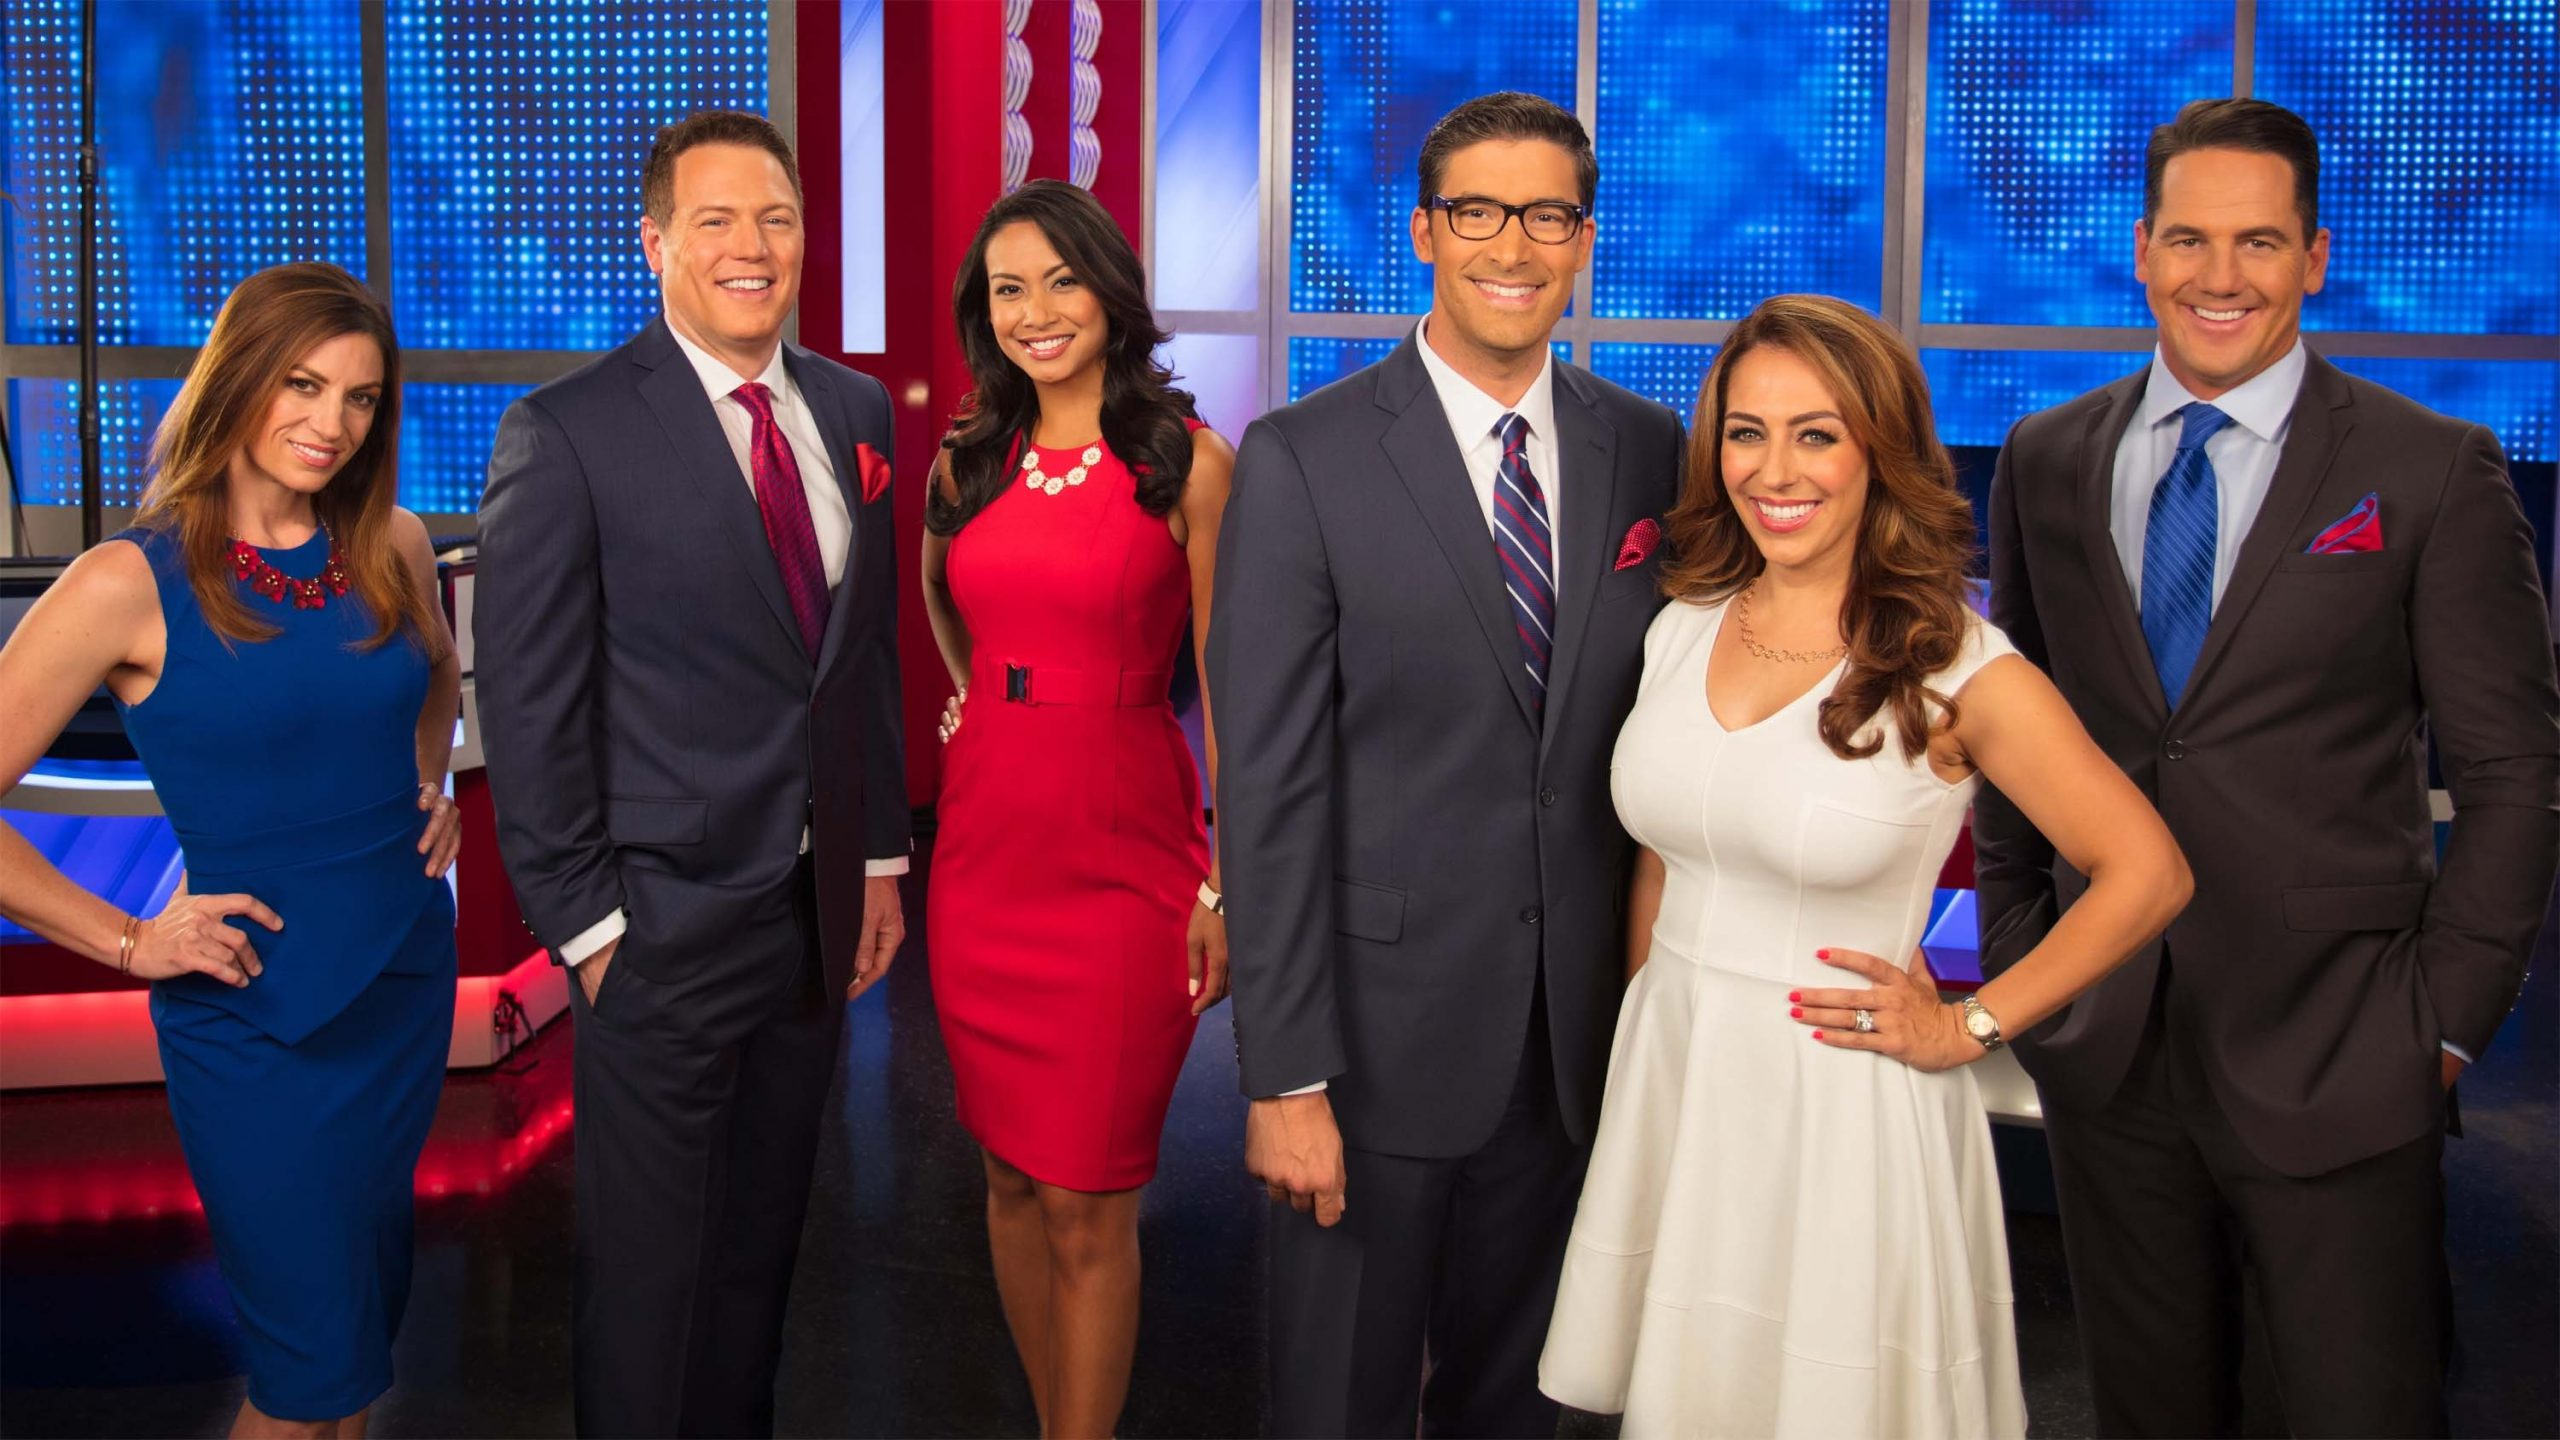 Morning Weather News Team Fox 5